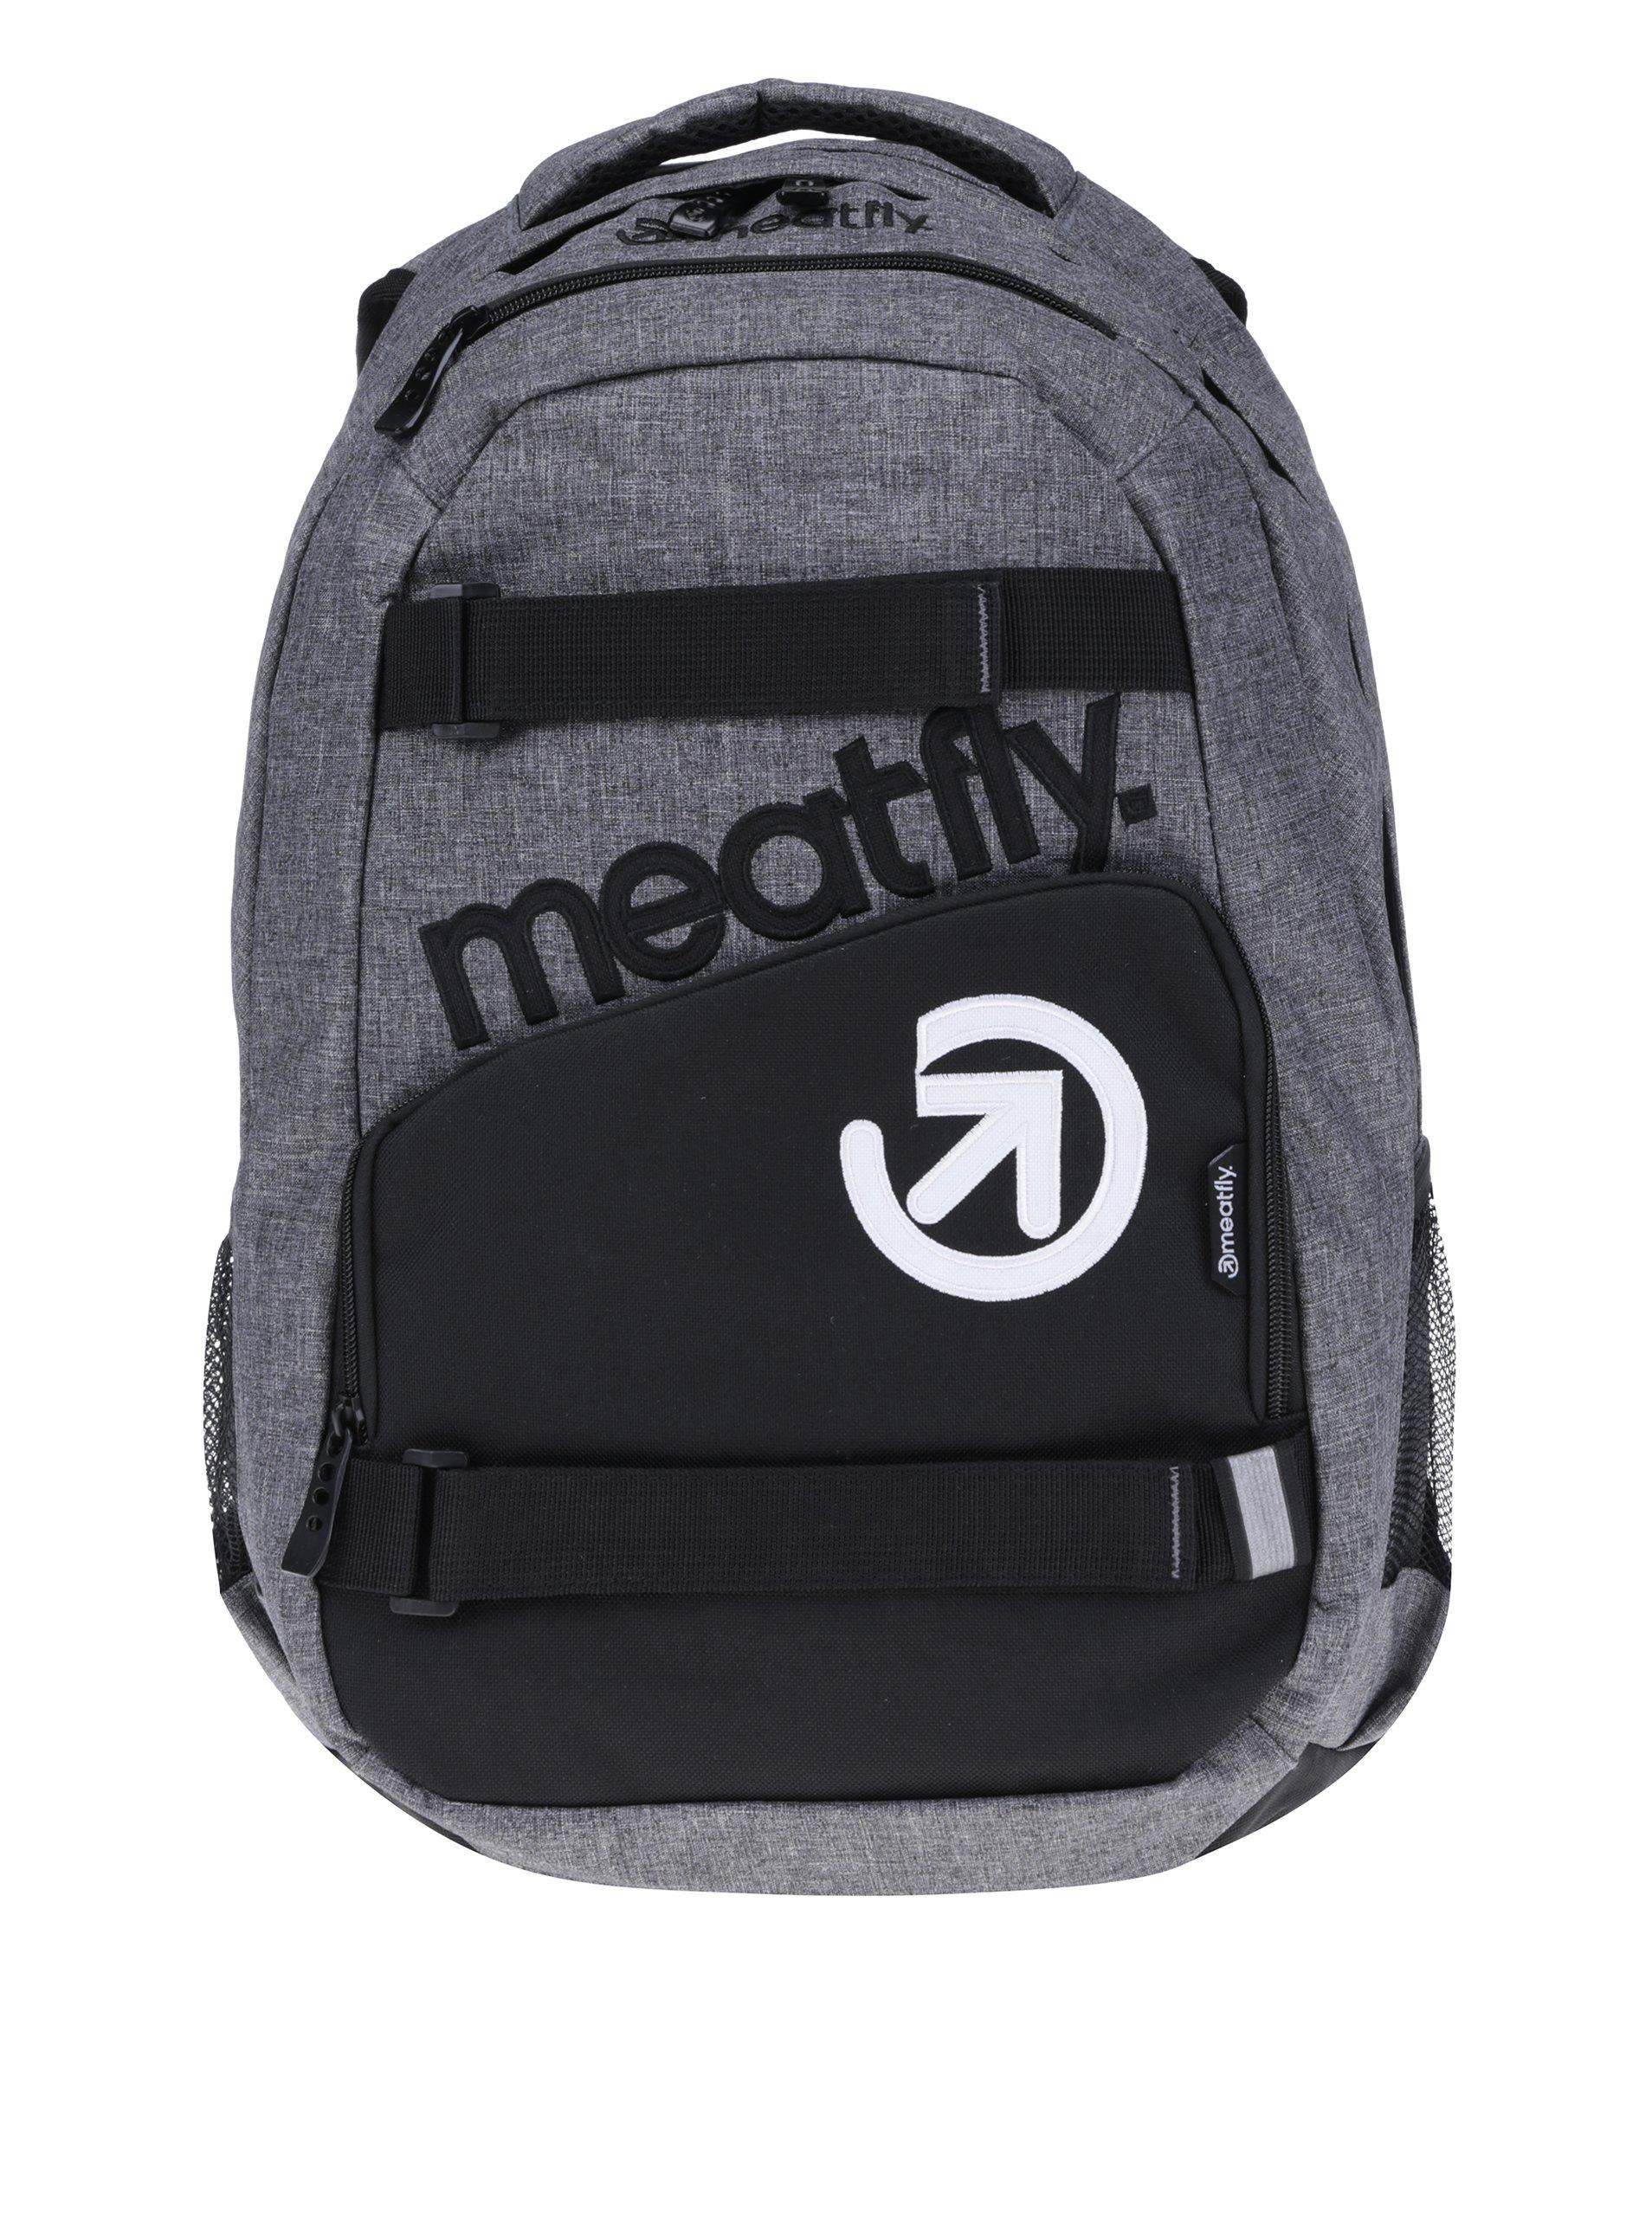 Čierno-sivý batoh Meatfly Exile 2 22 l